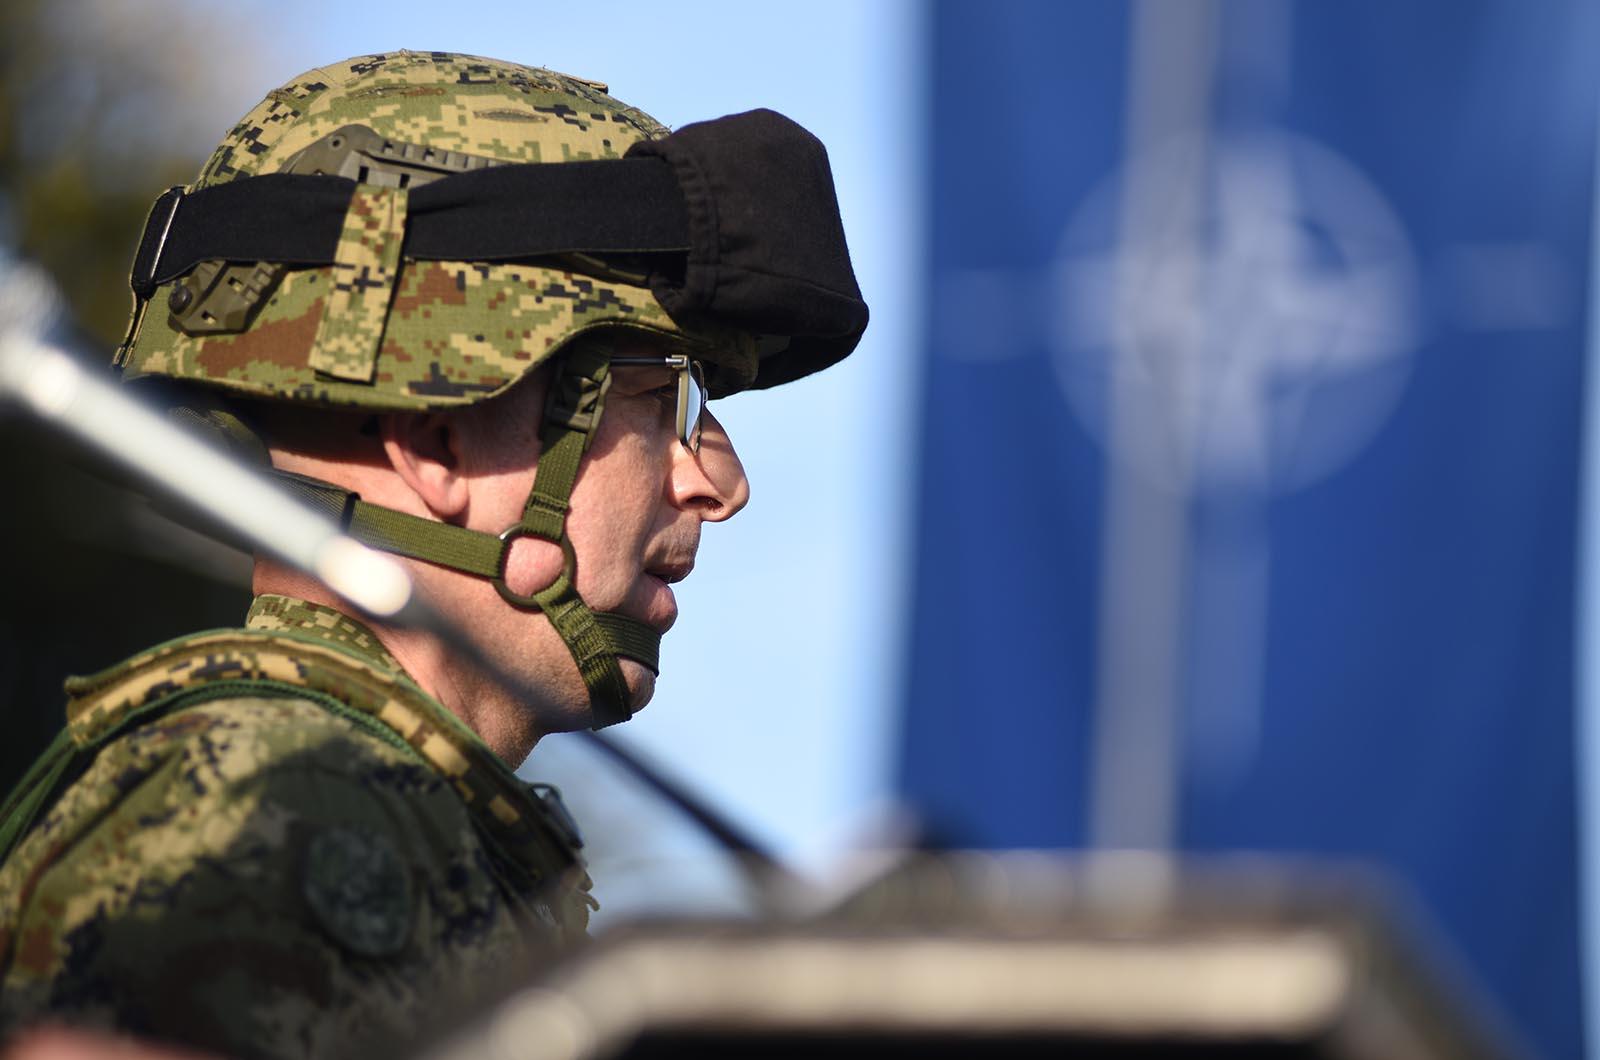 Zapovjednik 5. HRVCON-a eFPBG – POL bojnik Marijan Žukina